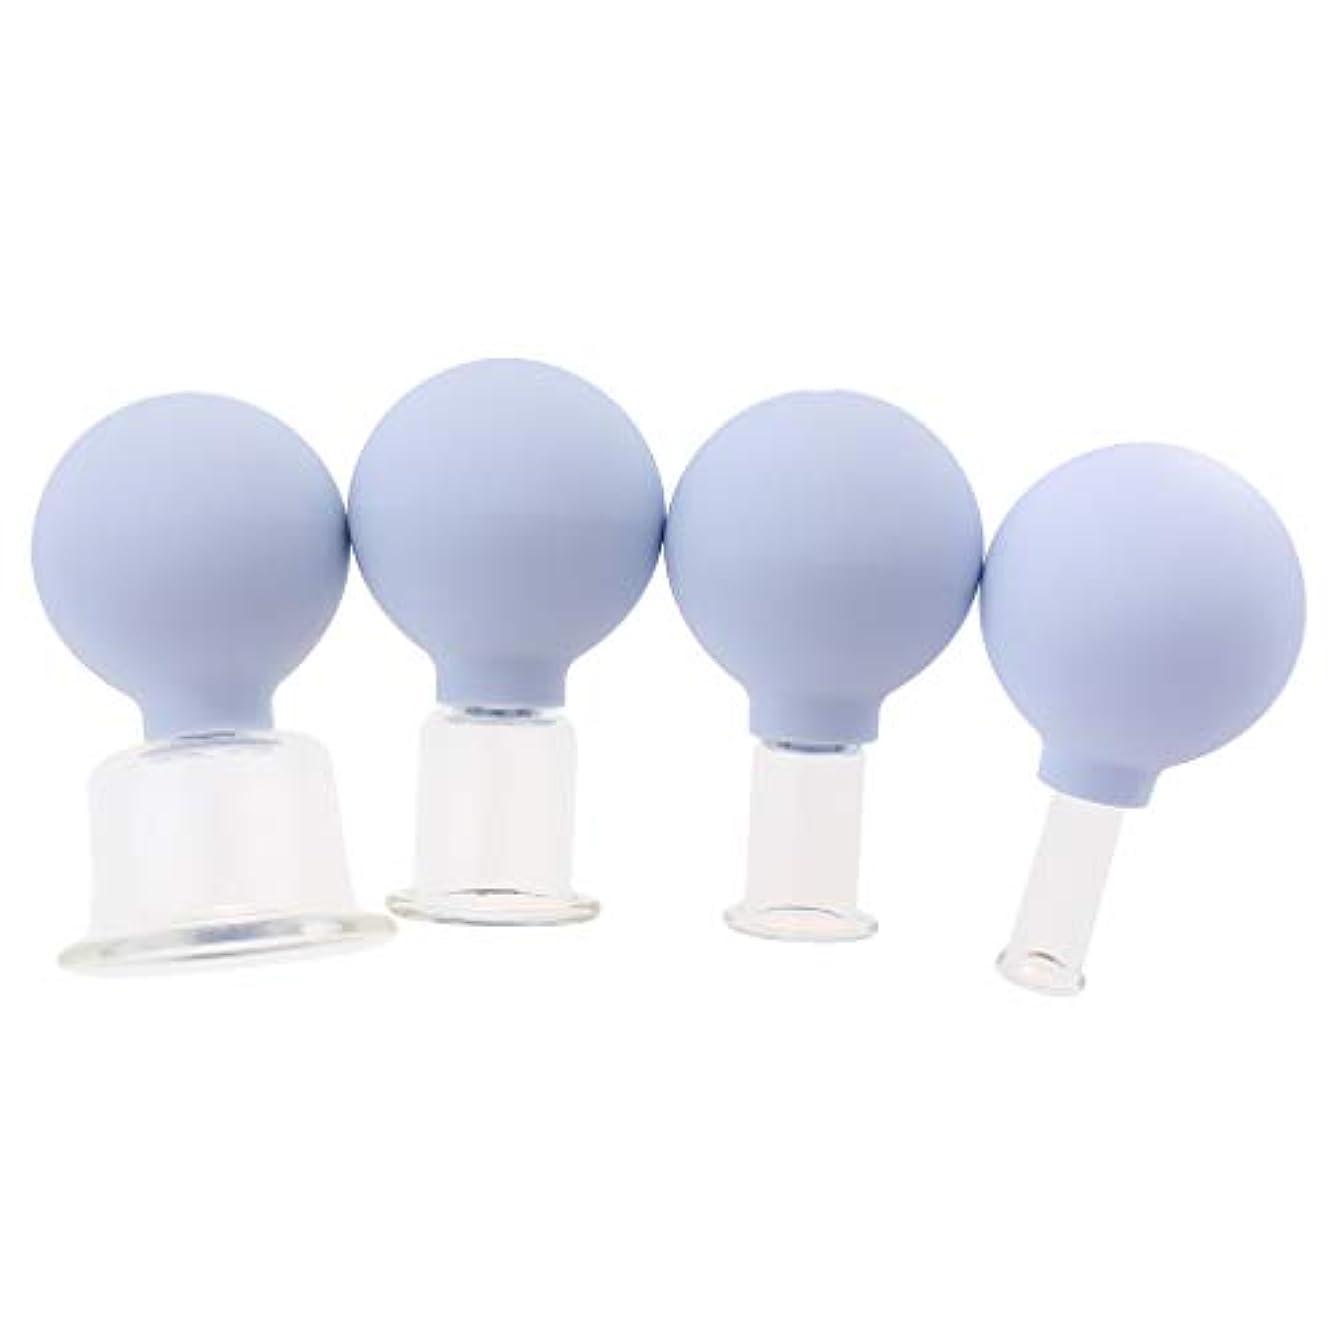 Fenteer ガラスカッピング マッサージ 吸い玉 真空 マッサージカップ 男女兼用 全身マッサージ用 4個 全3色 - 白